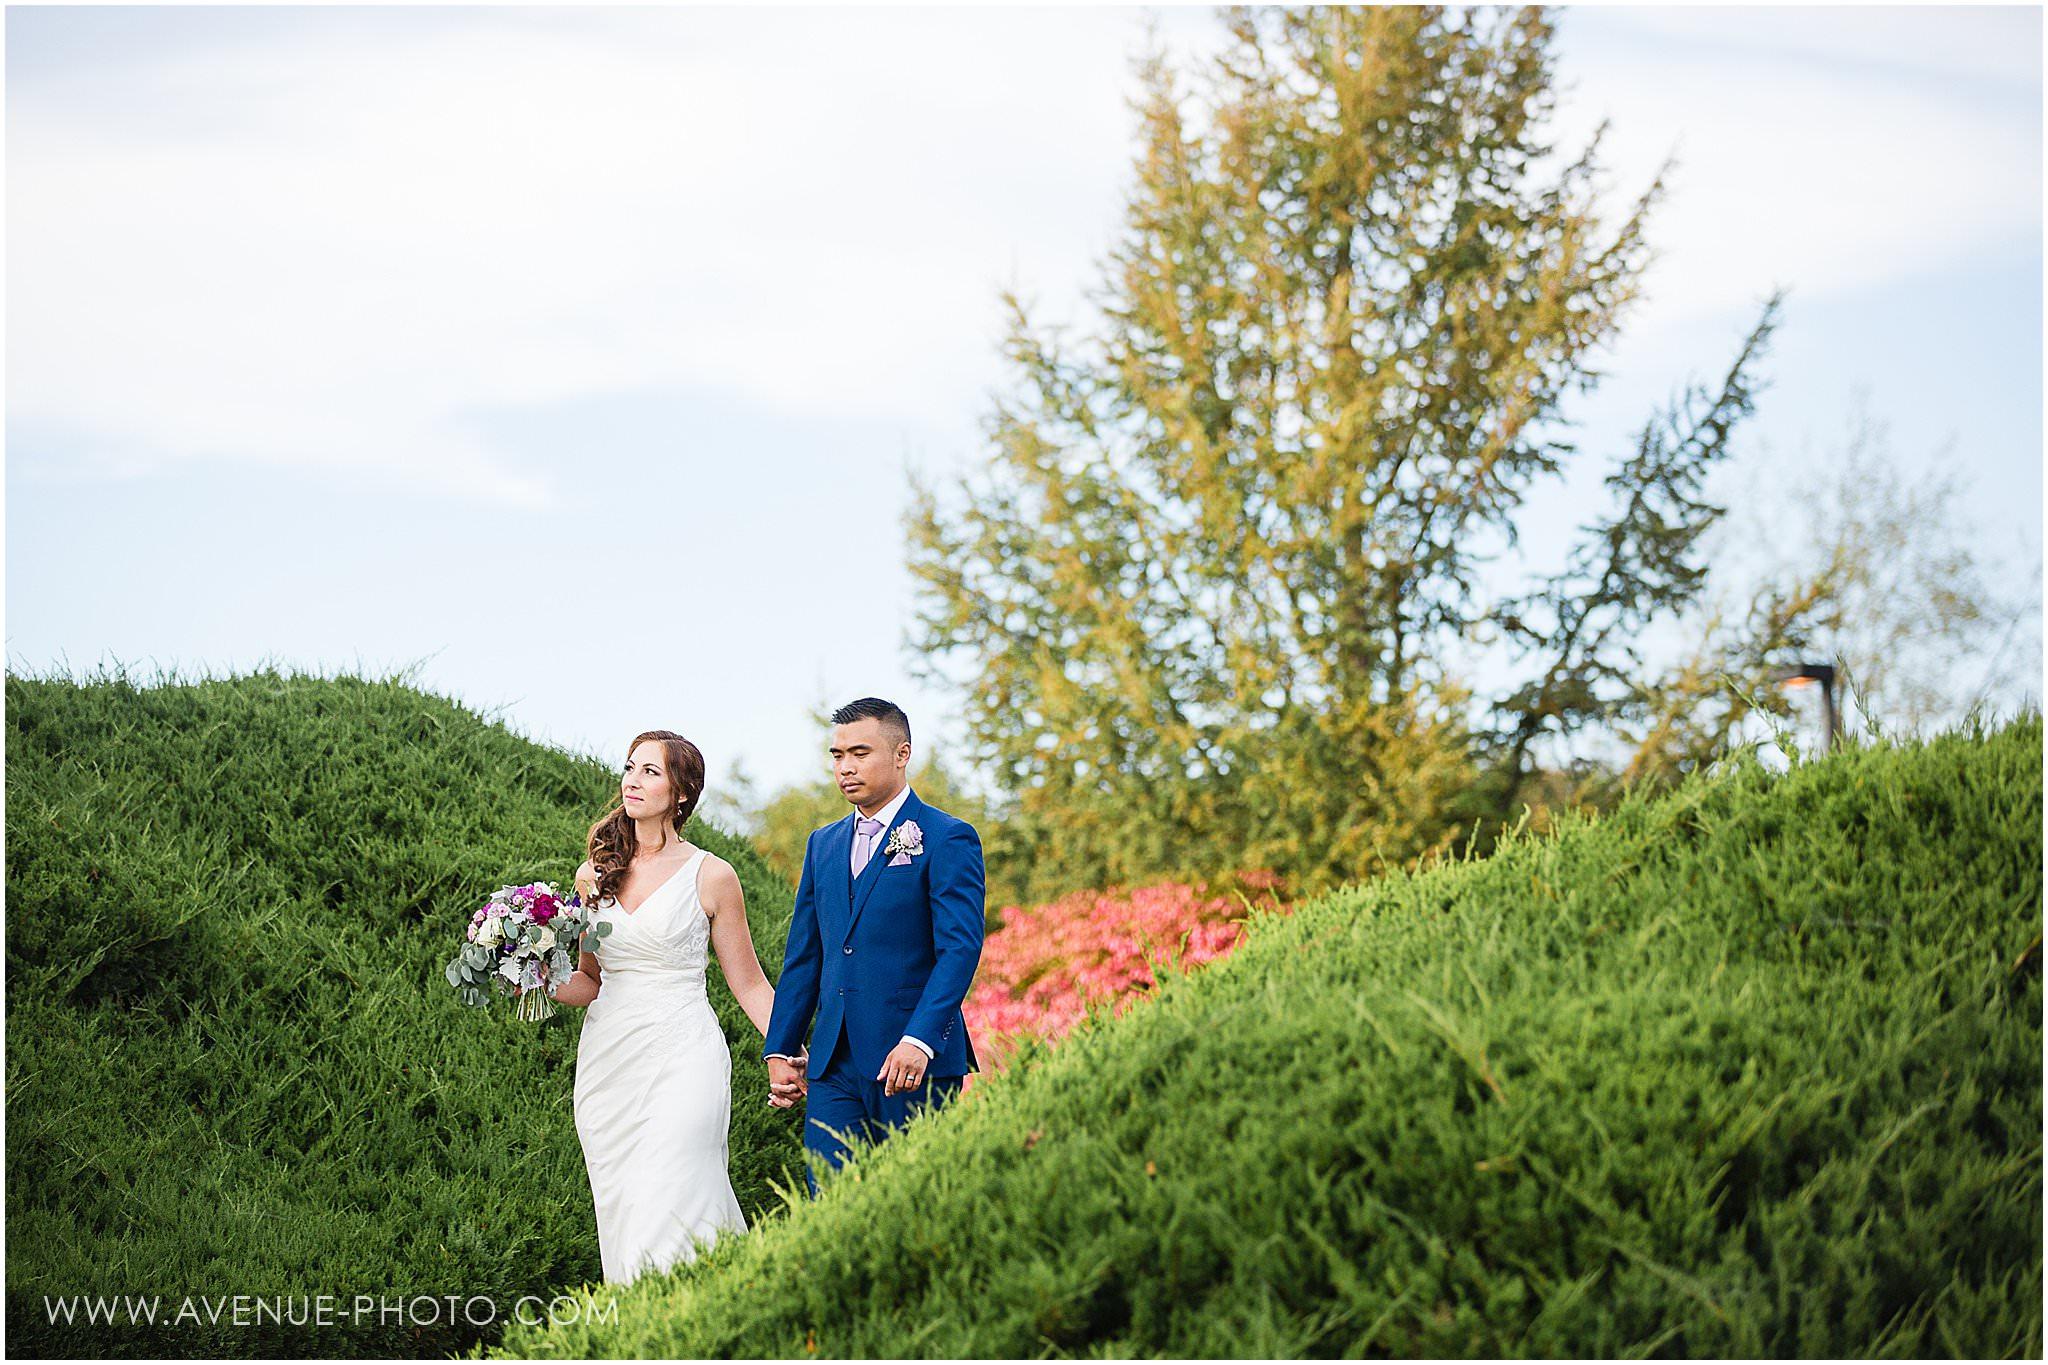 deer creek wedding, deer creek wedding photography, deer creek wedding photos, deer creek wedding pictures, golf course wedding venues toronto